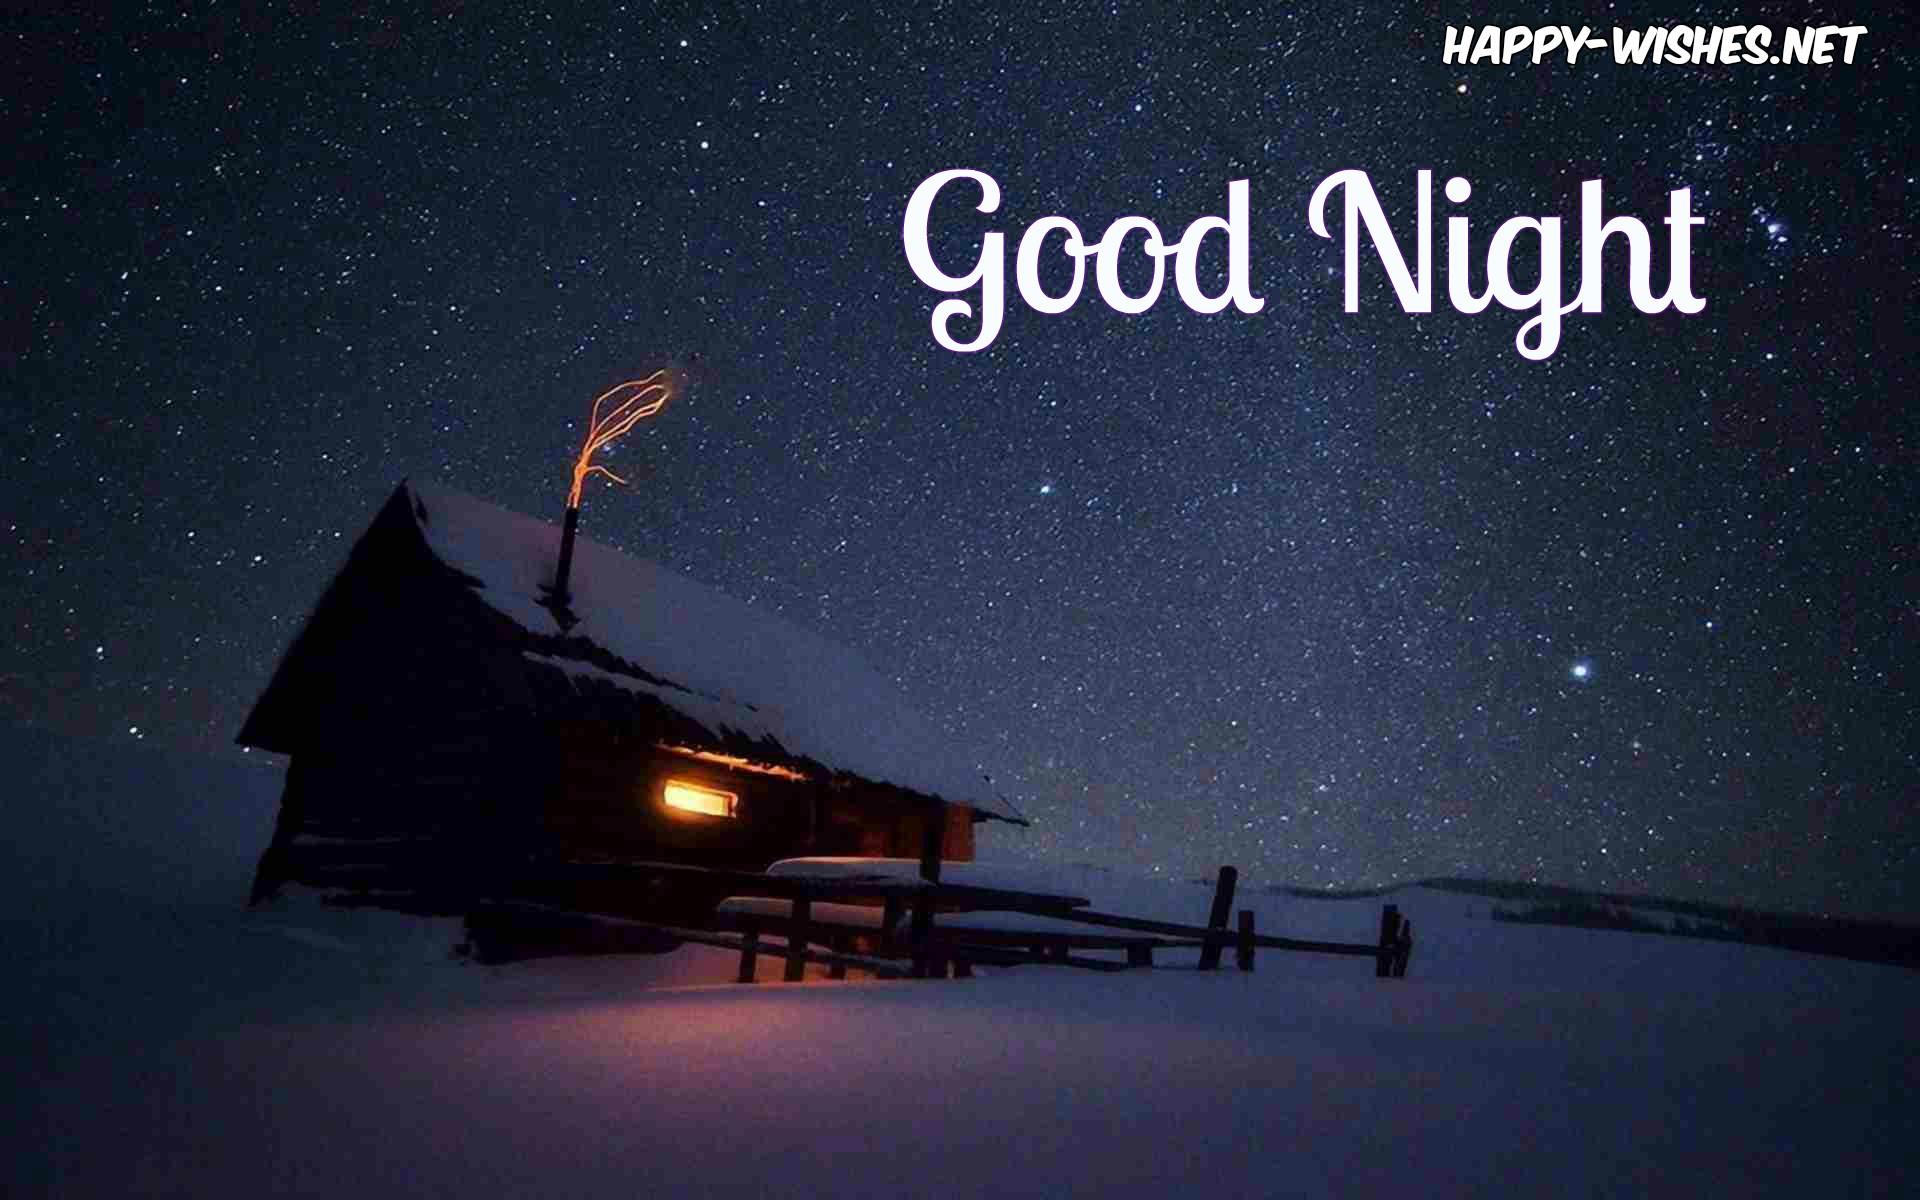 Best Good Night Wallpaper Good Night In Winter Season 3246603 Hd Wallpaper Backgrounds Download